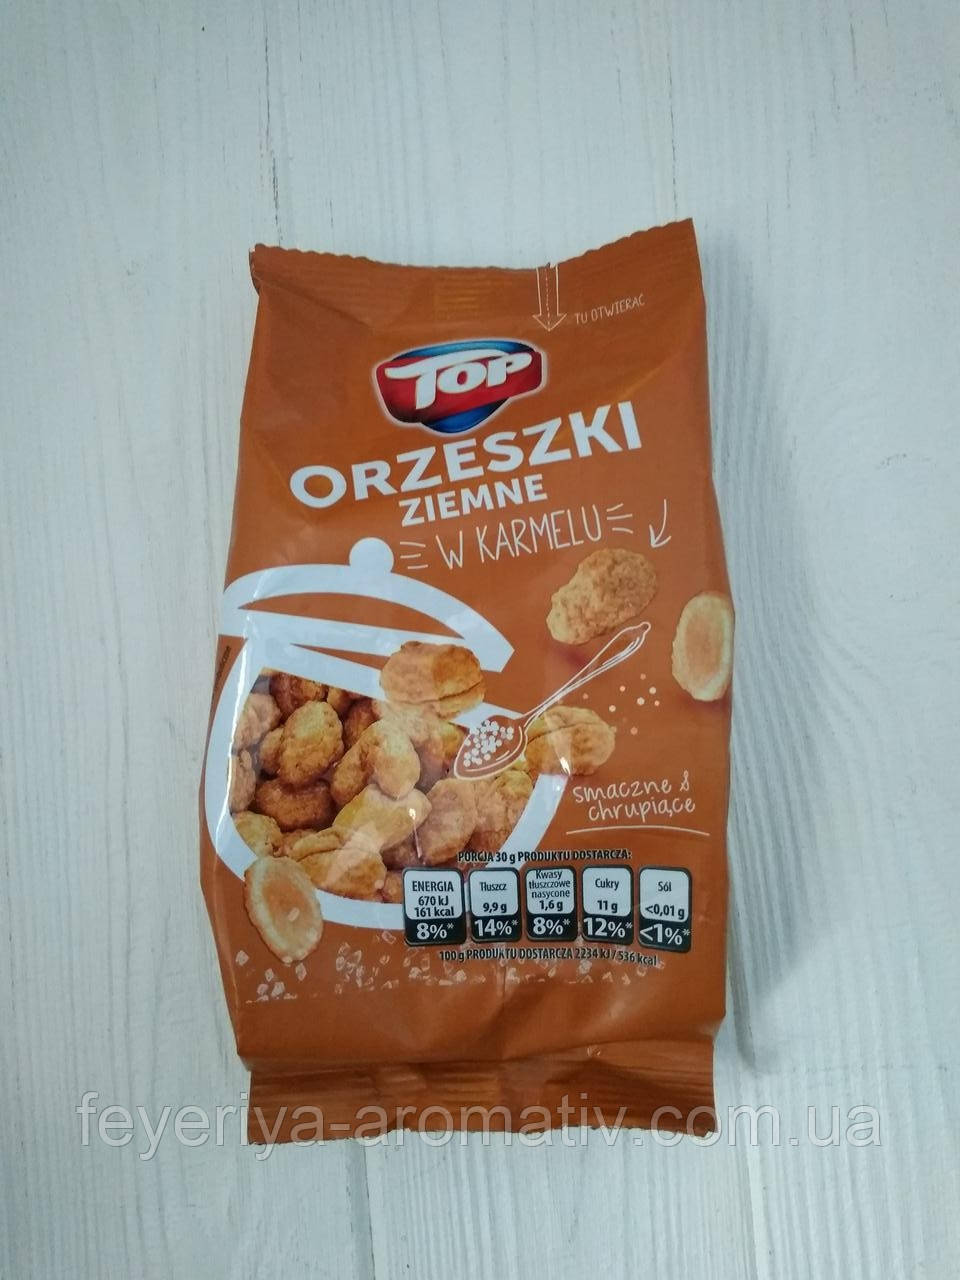 Арахис в карамели Top Orzeszki ziemne w karamelu 200гр (Польша)